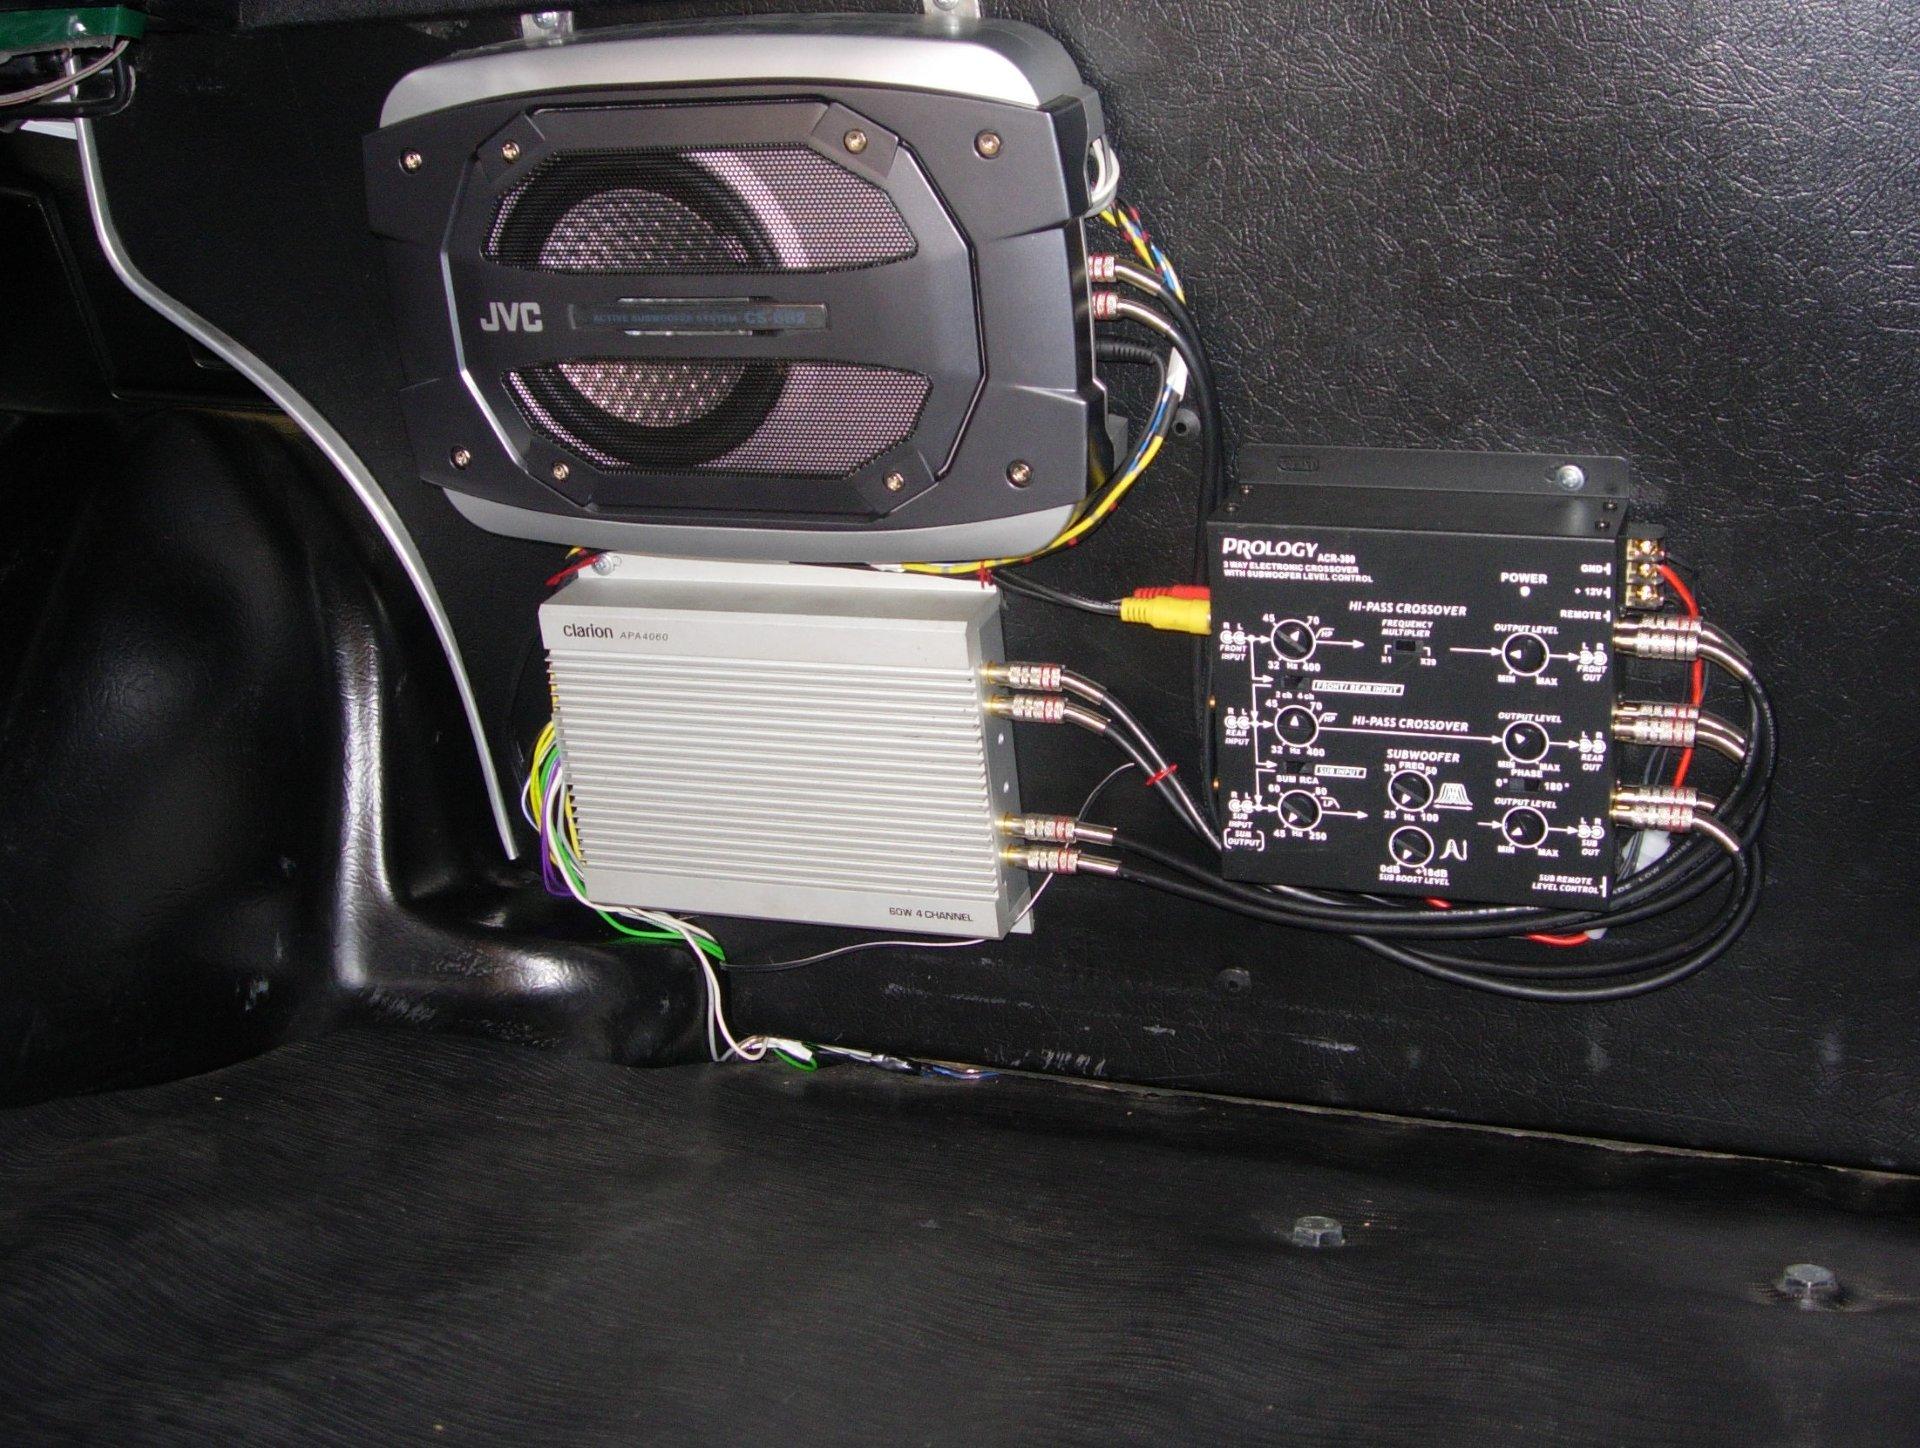 450sl fuel filter replacement slk230 fuel filter